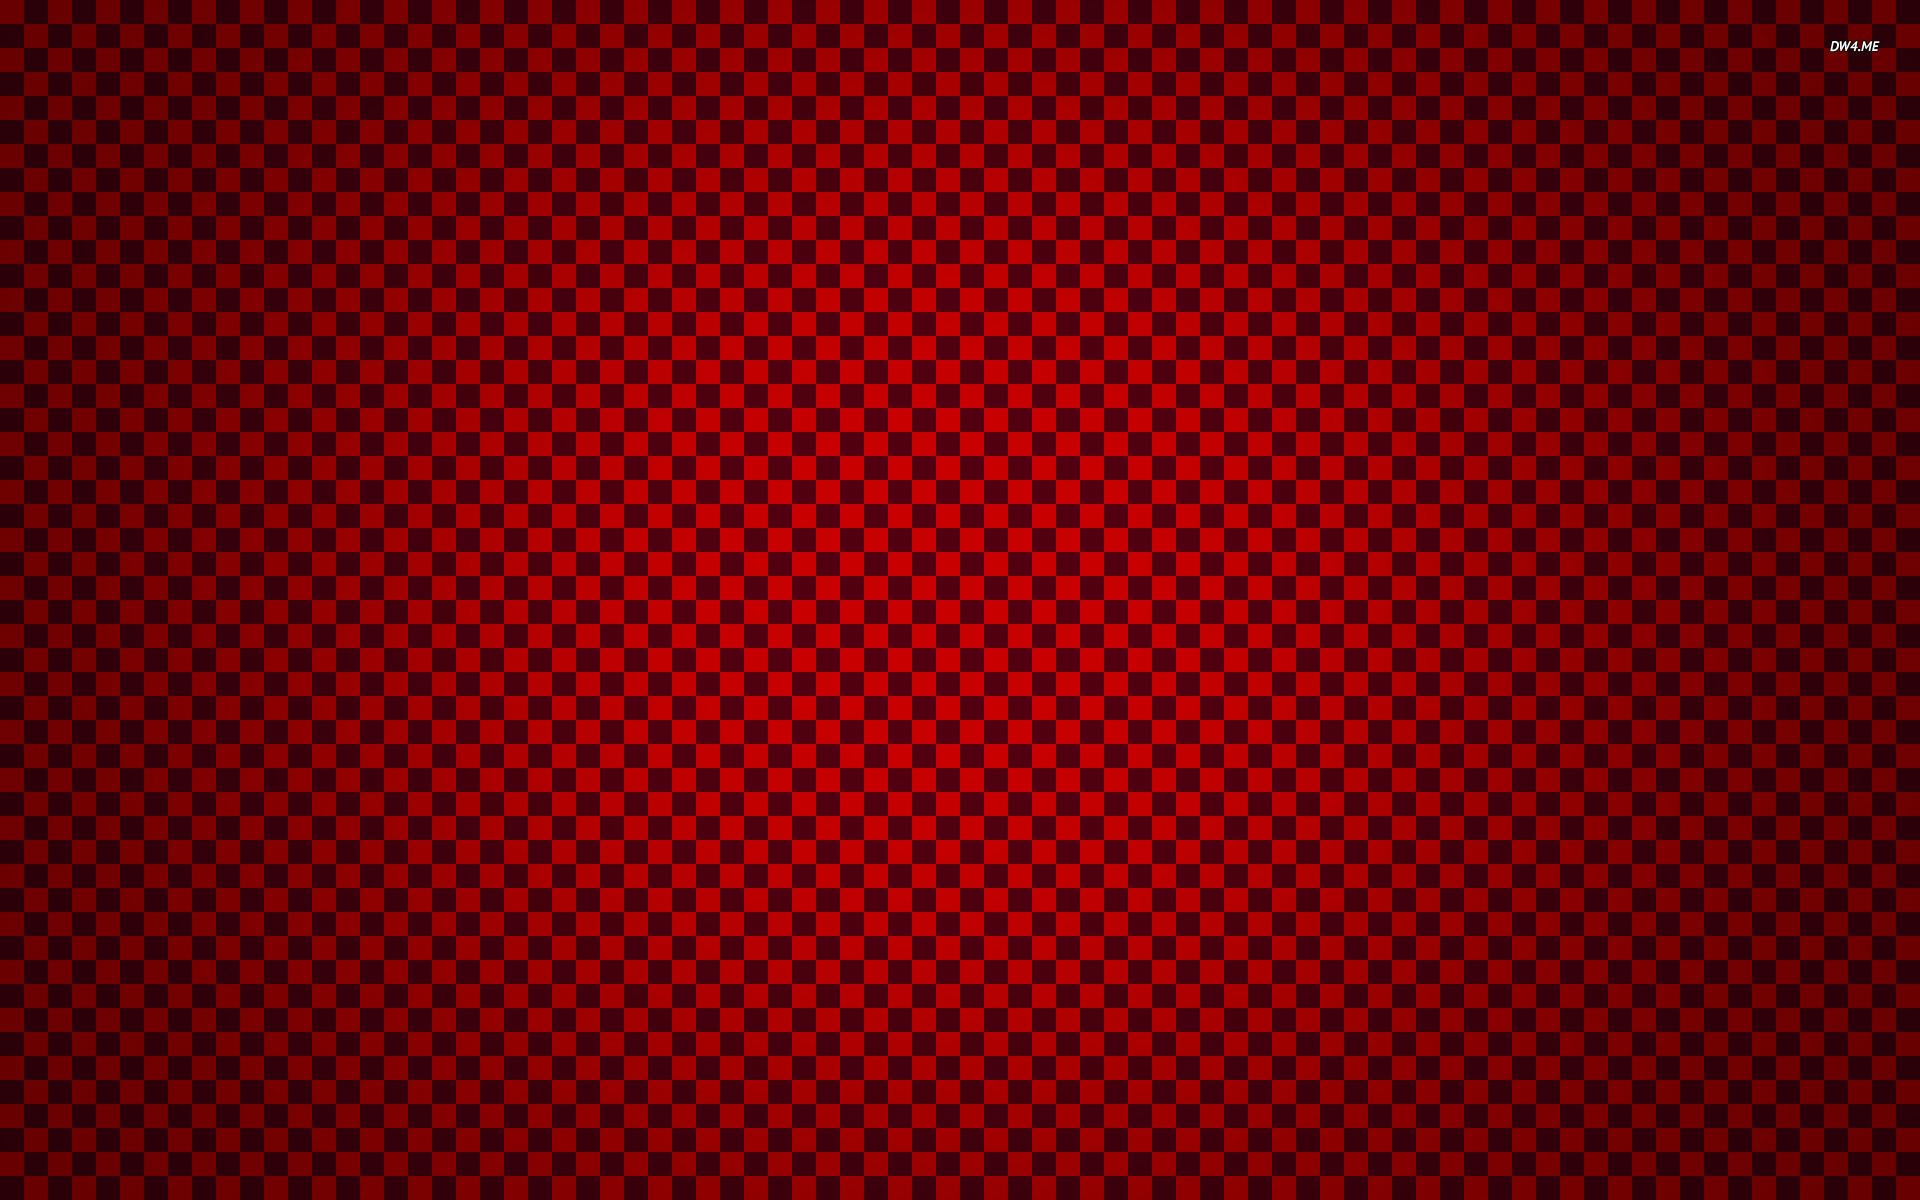 Red checkered pattern wallpaper – Digital Art wallpapers – #1283